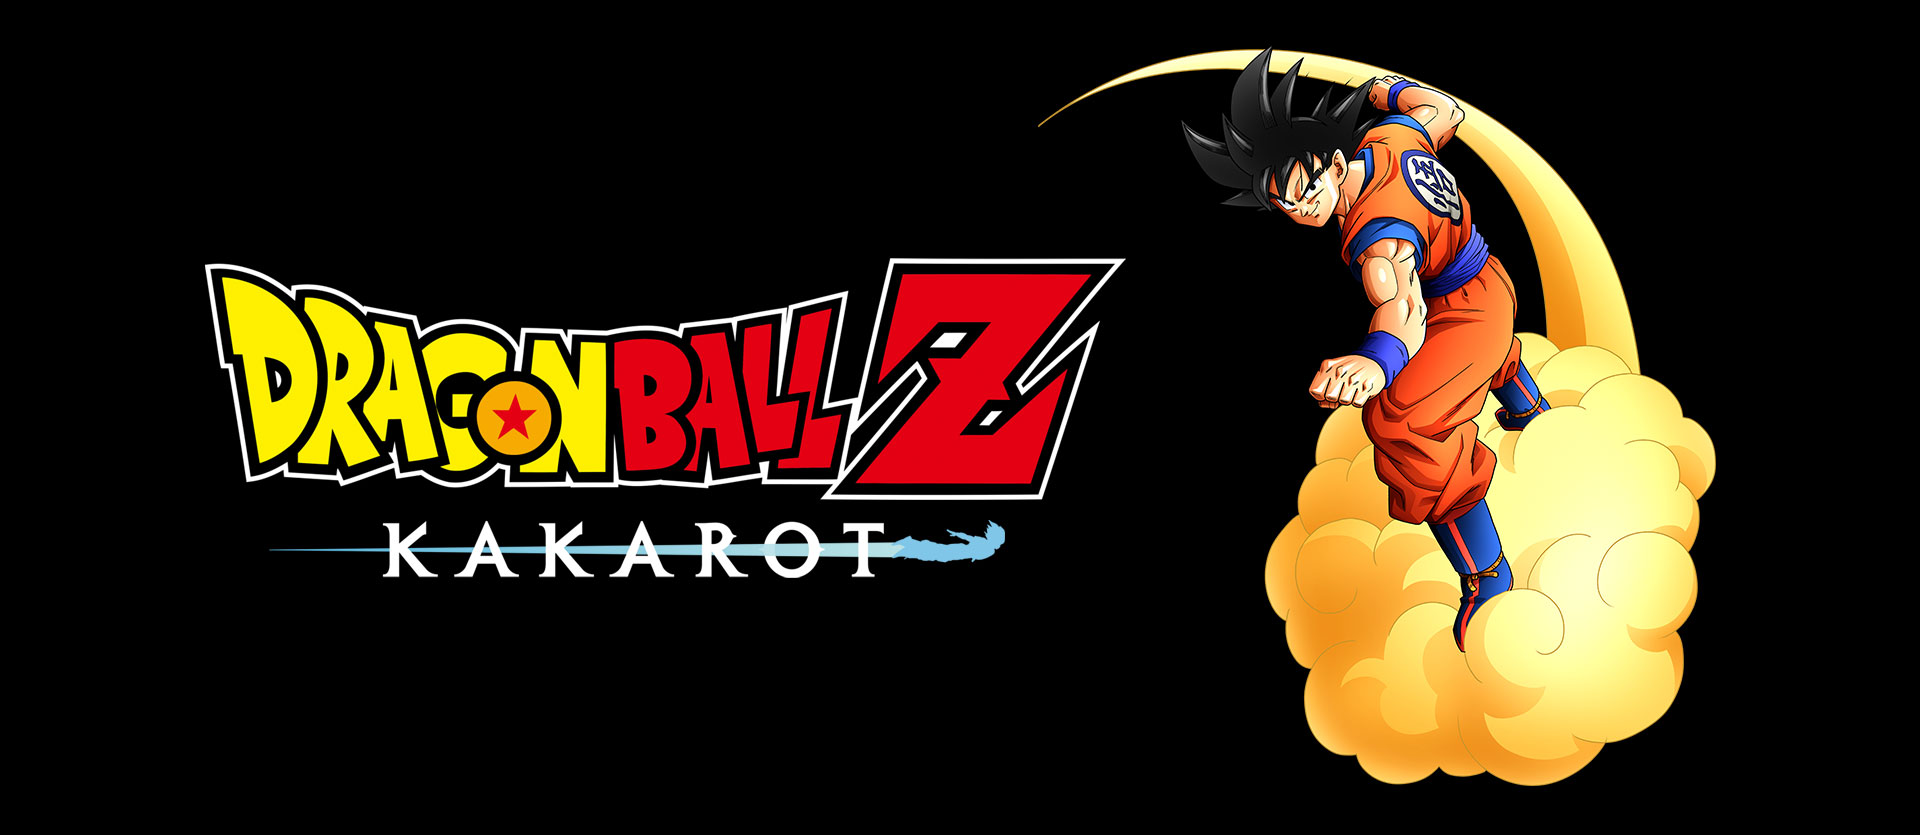 Dragon Ball Z: Kakarot logo with Goku on a cloud